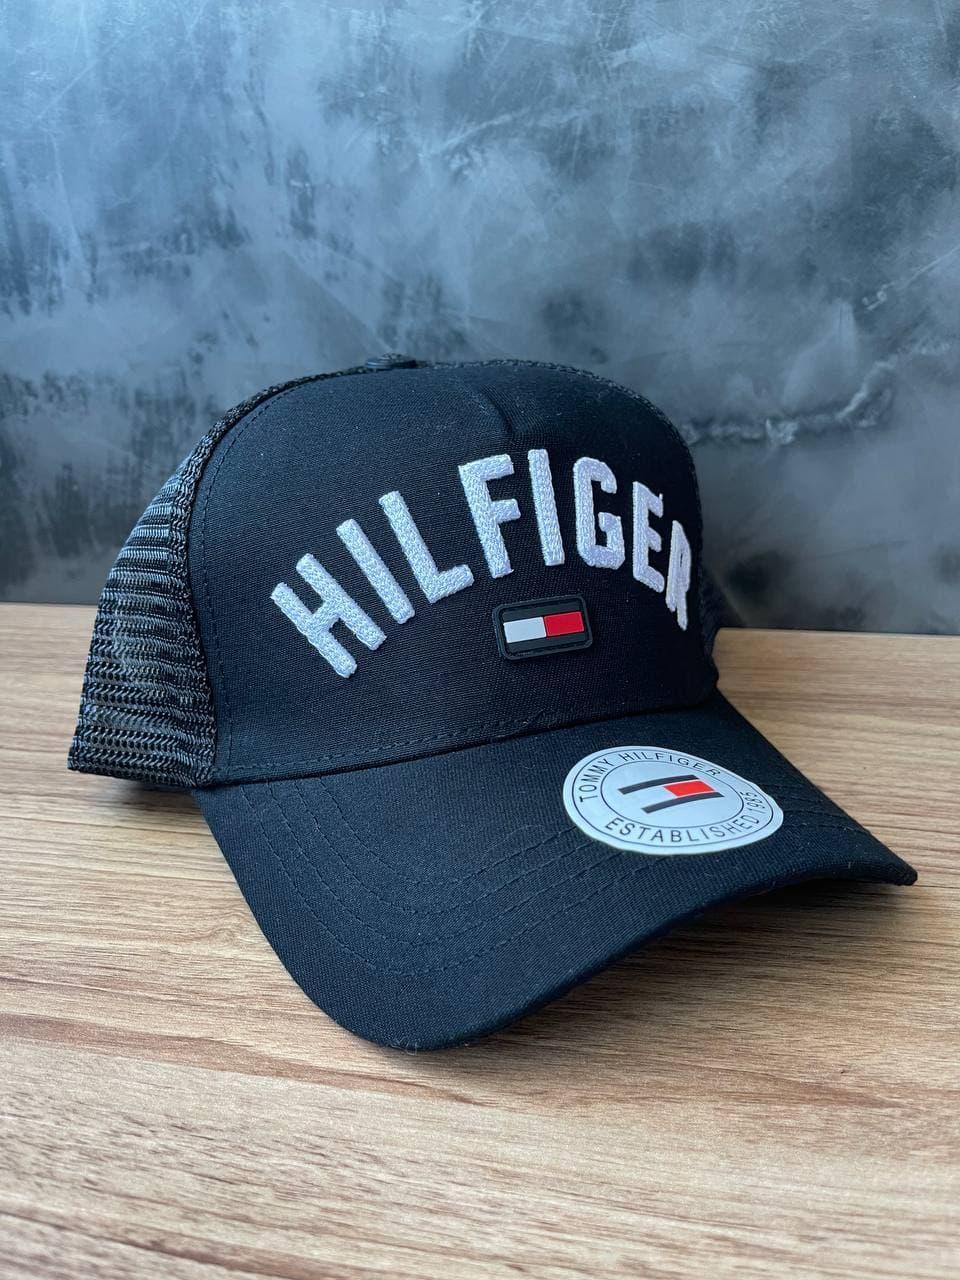 Кепка мужская Tommy Hilfiger. Летняя бейсболка.